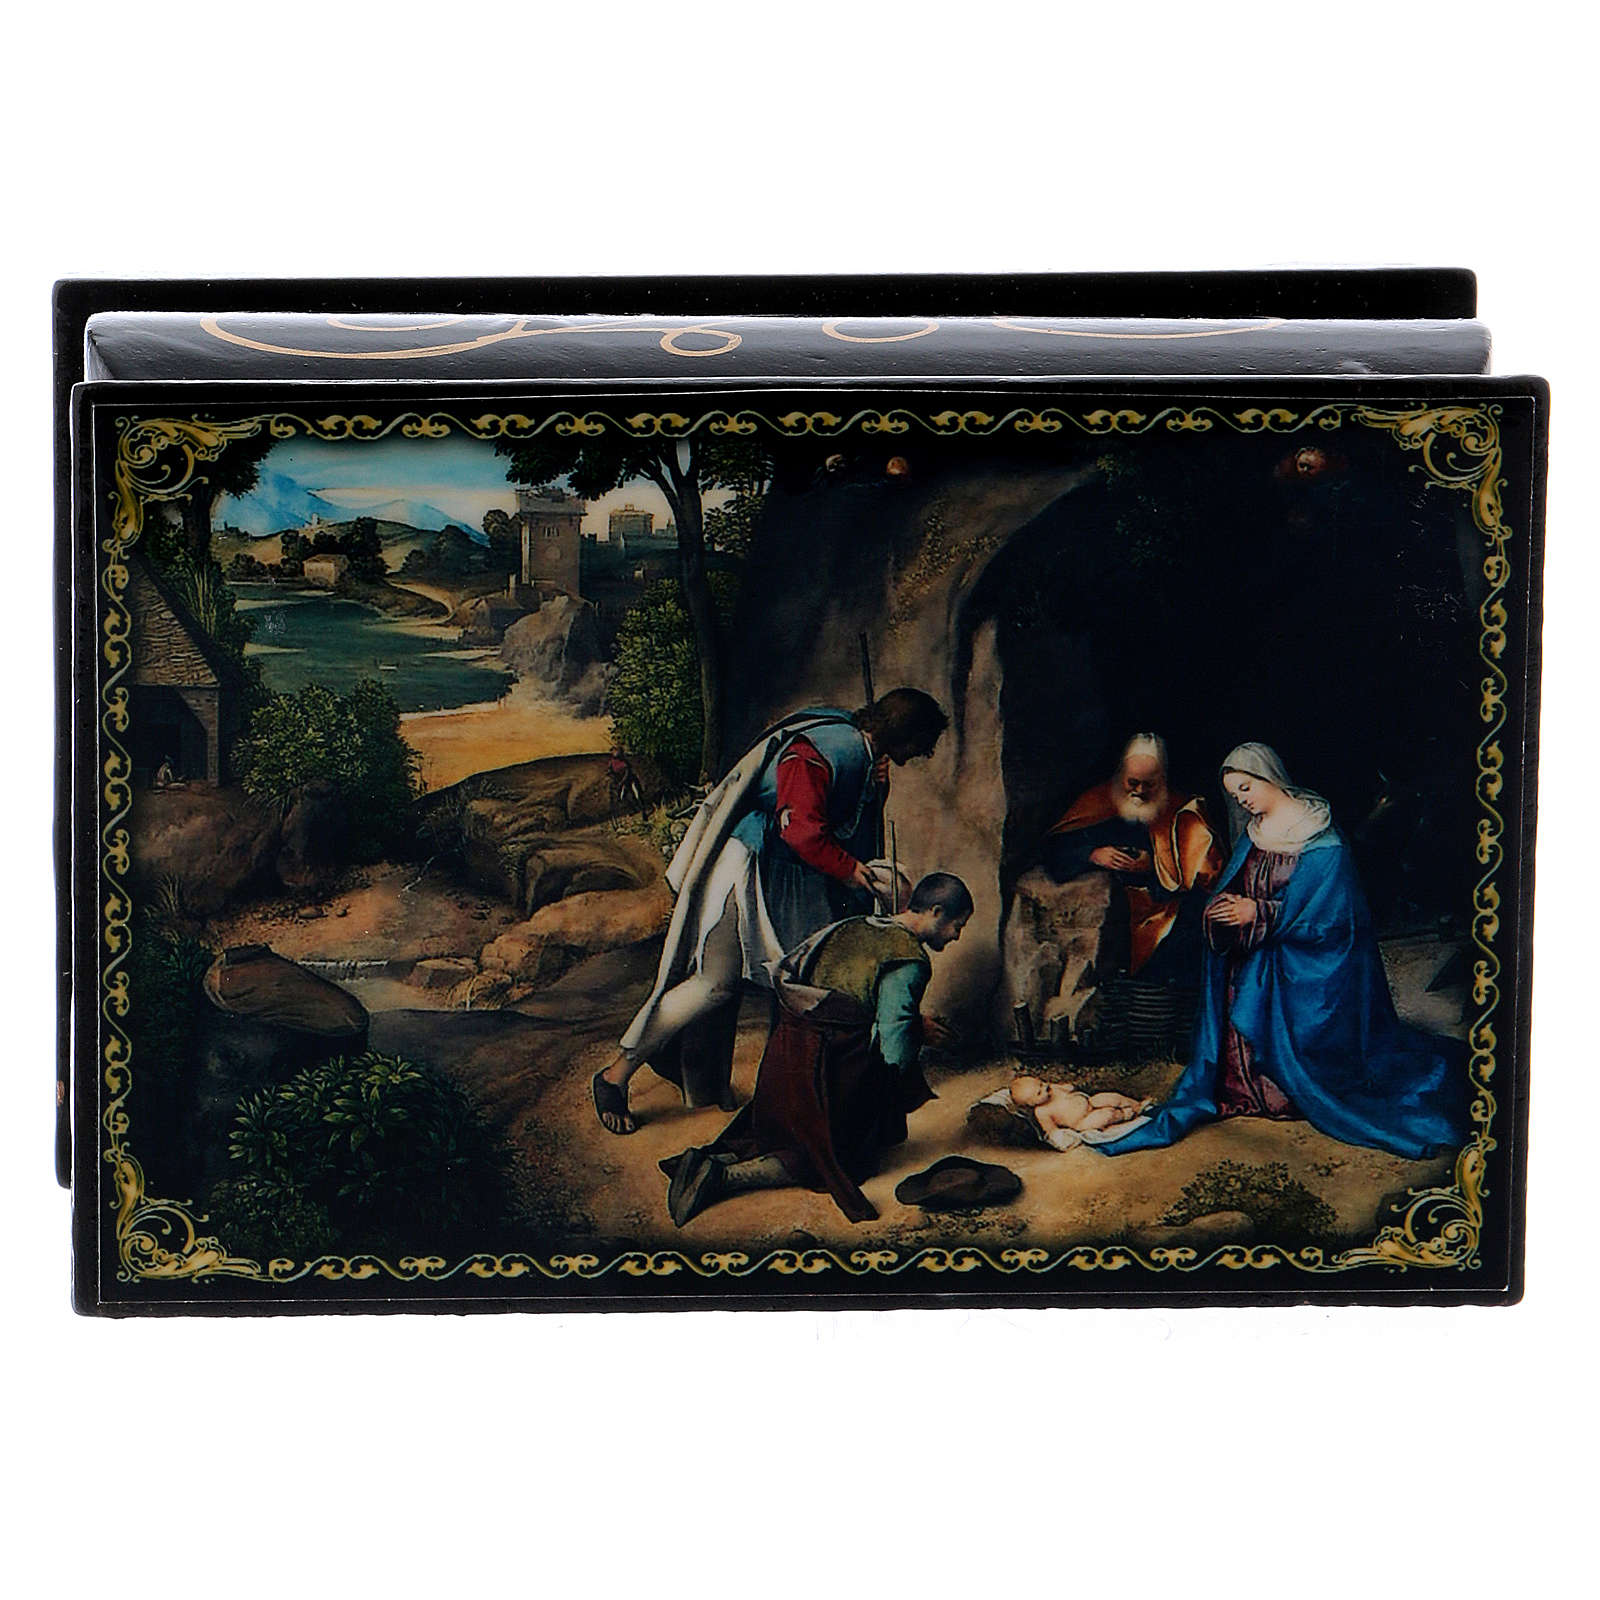 Russian papier-mâché and lacquer box The Adoration of the Shepherds 9x6 cm 4